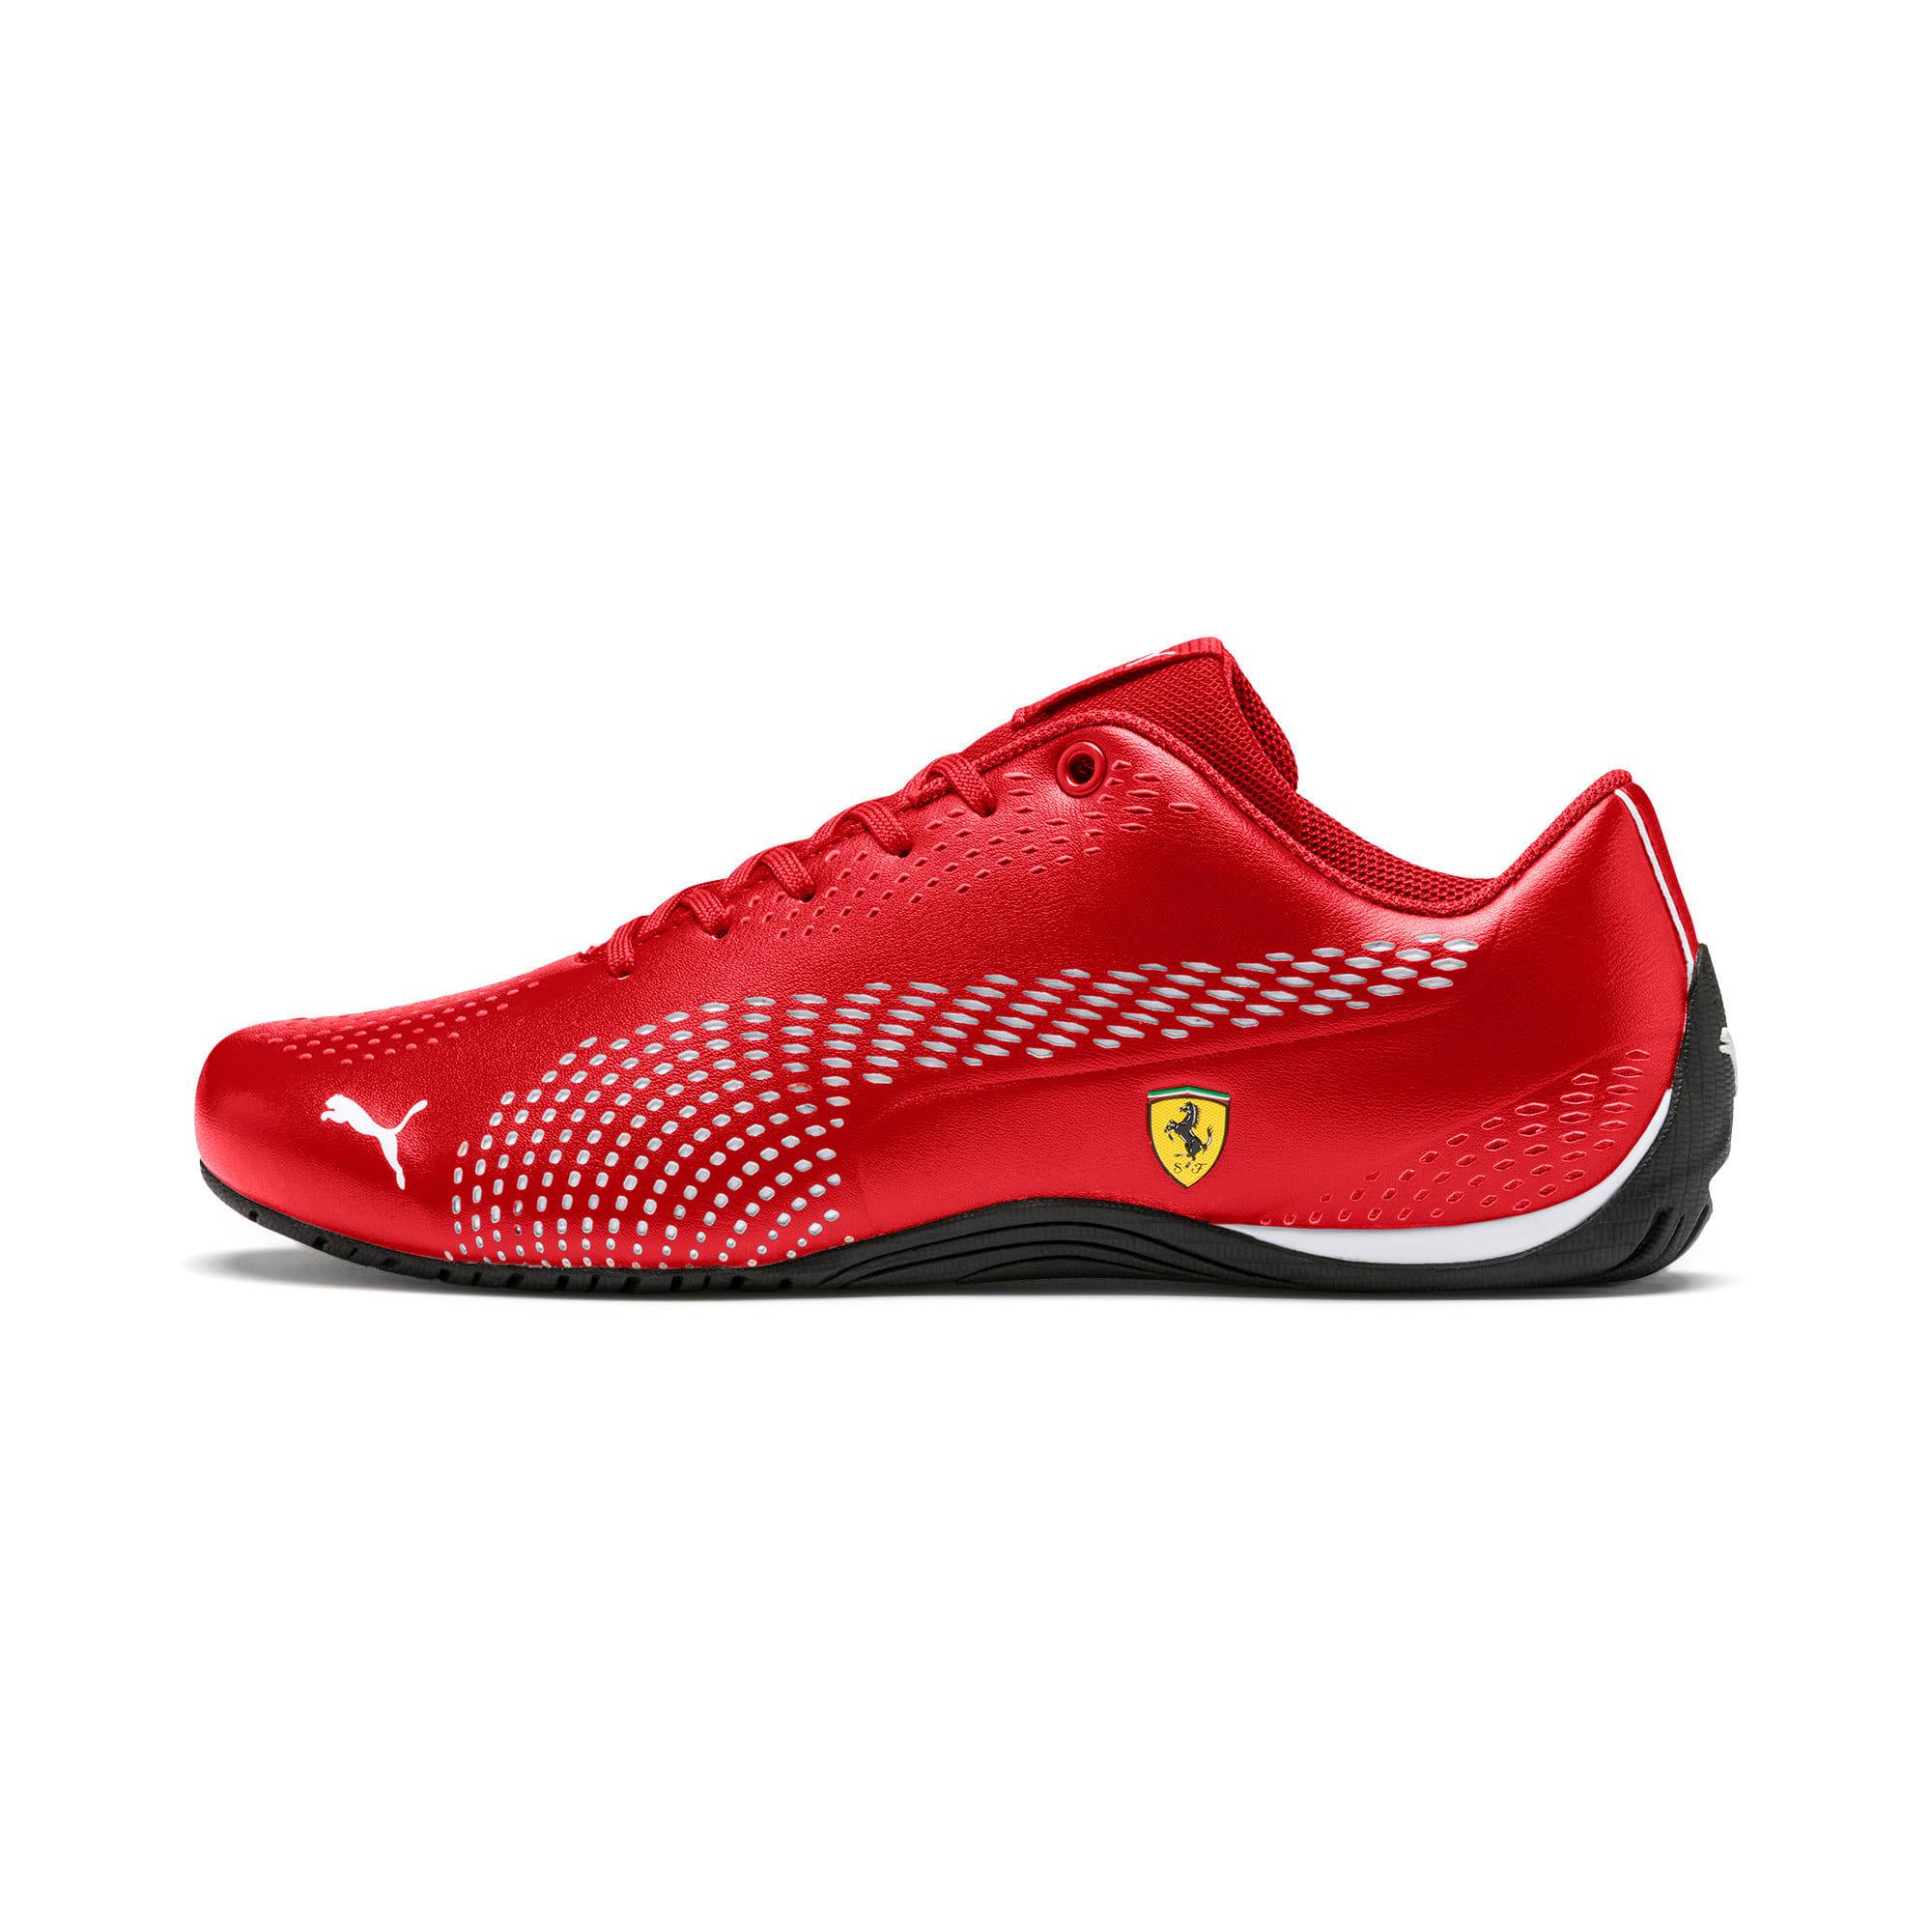 Thumbnail 1 of Ferrari Drift Cat 5 Ultra II Trainers, Rosso Corsa-Puma White, medium-IND